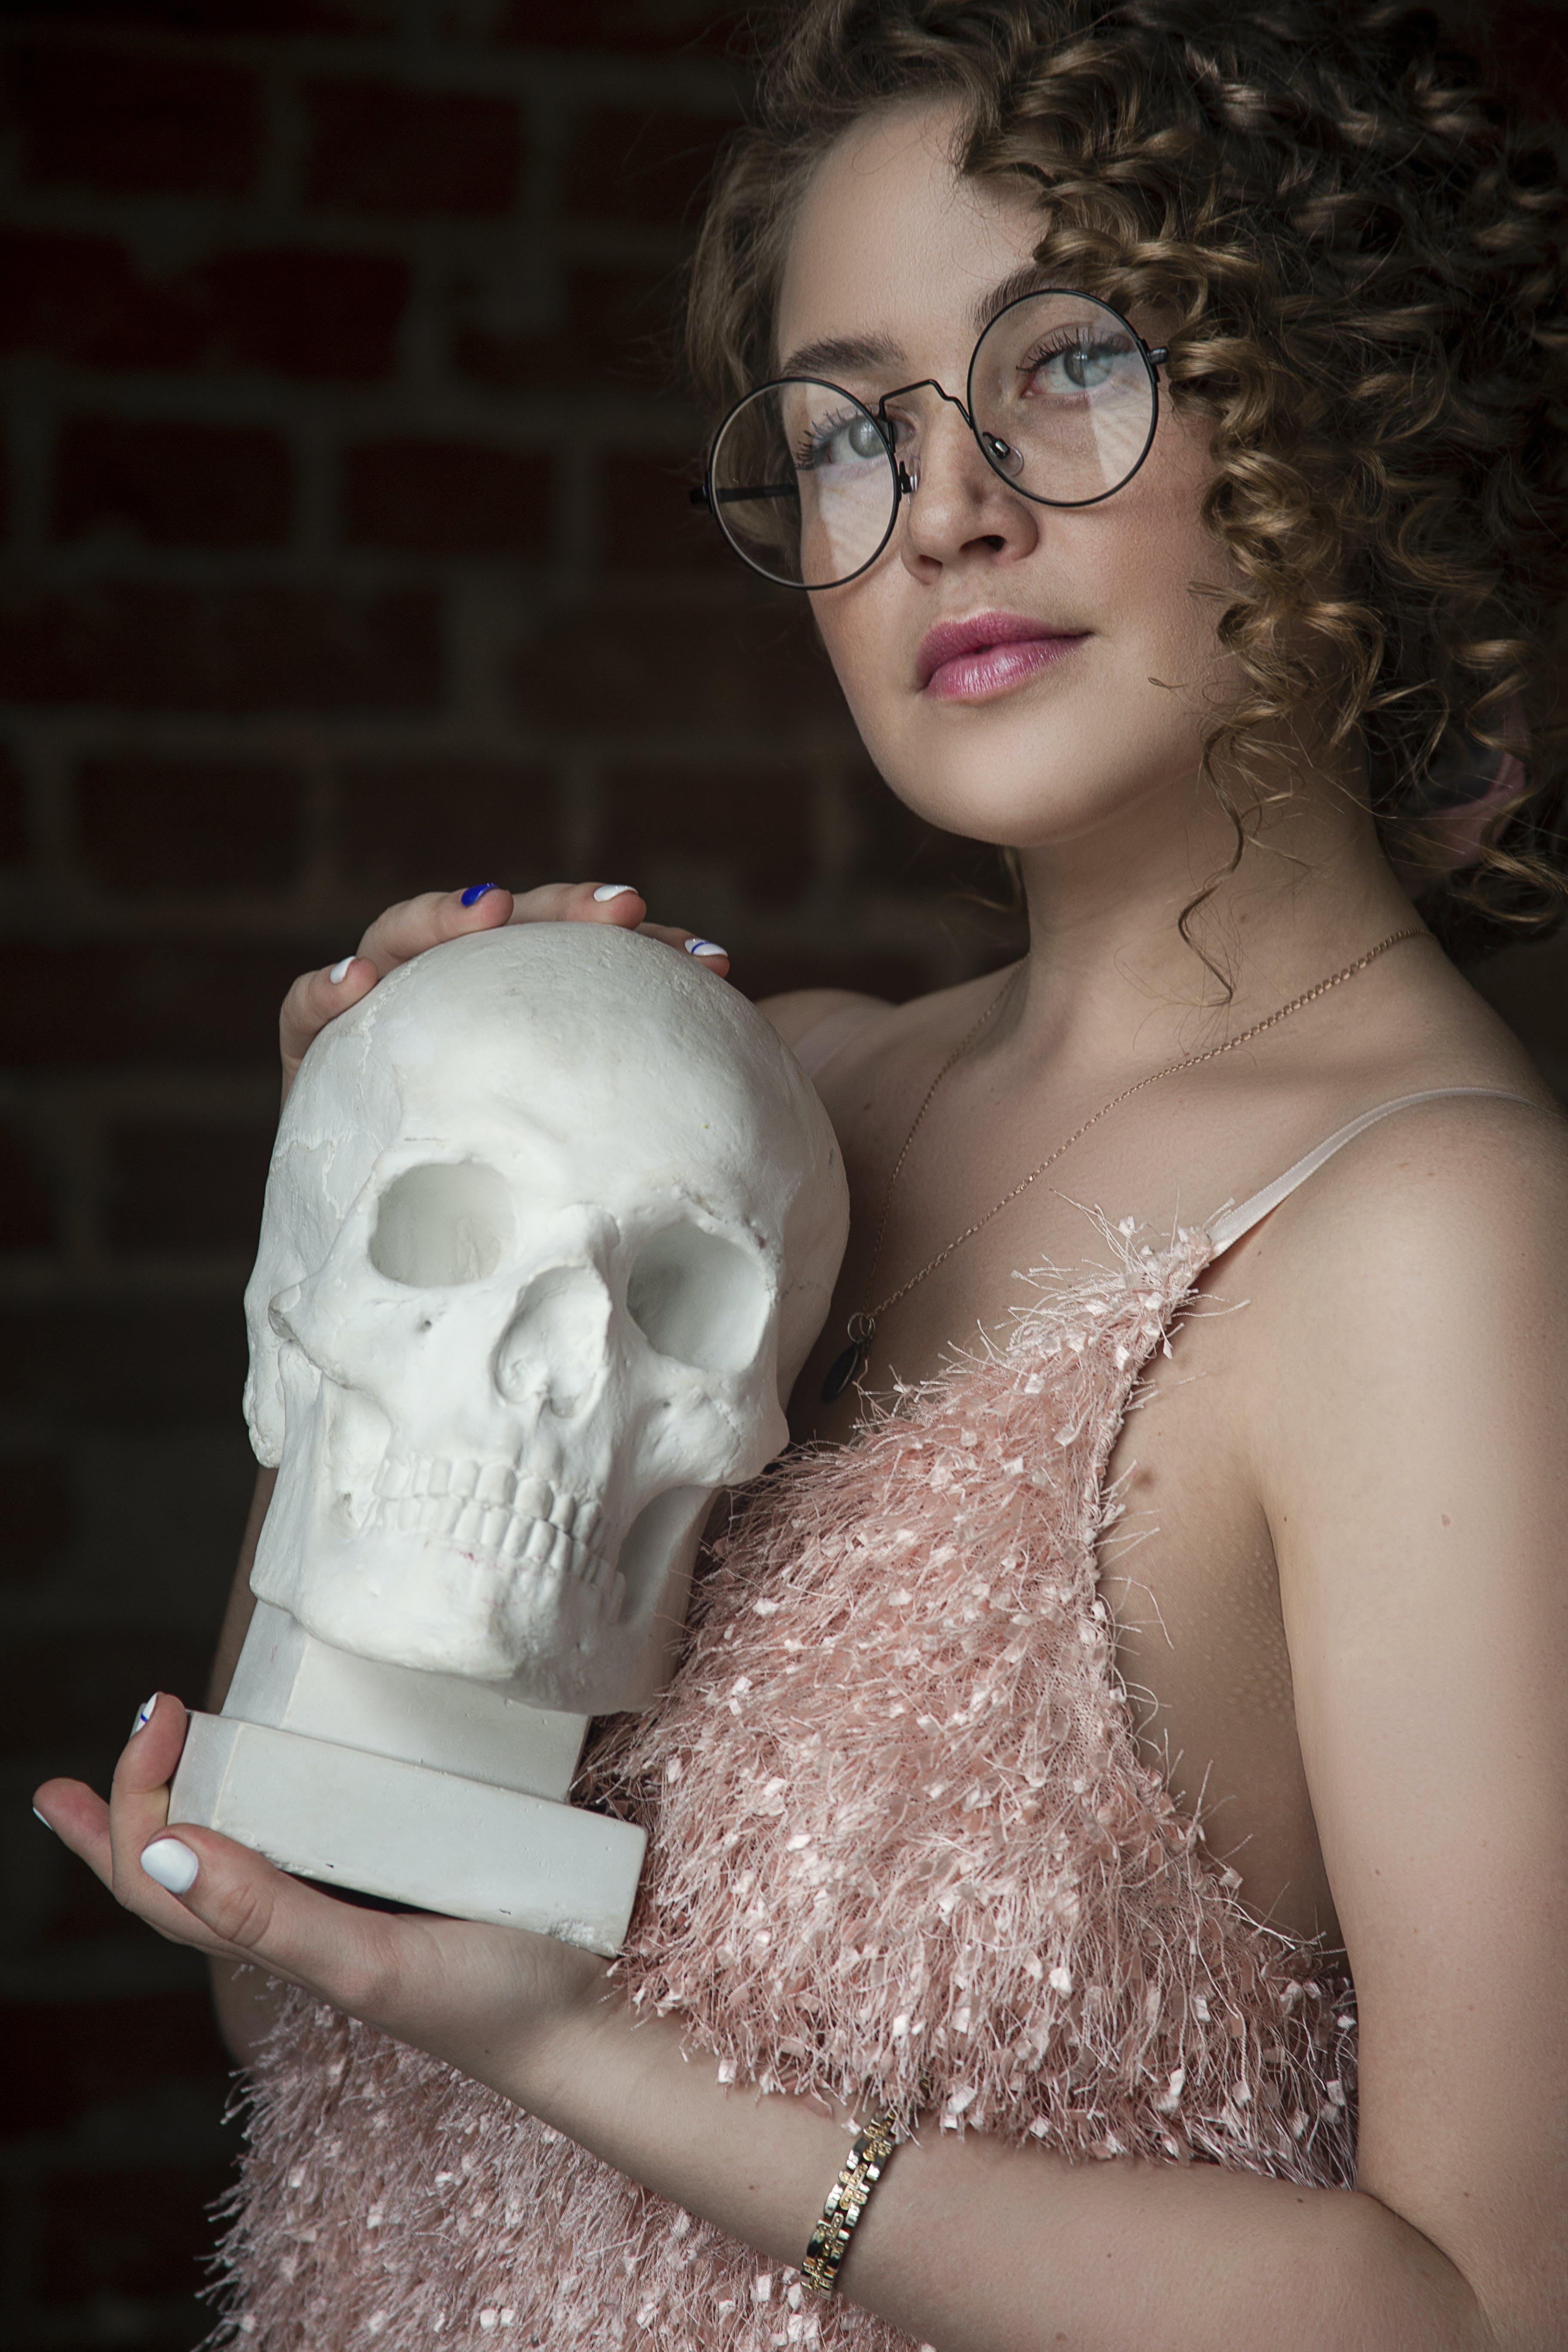 Woman Holding Skull Replica